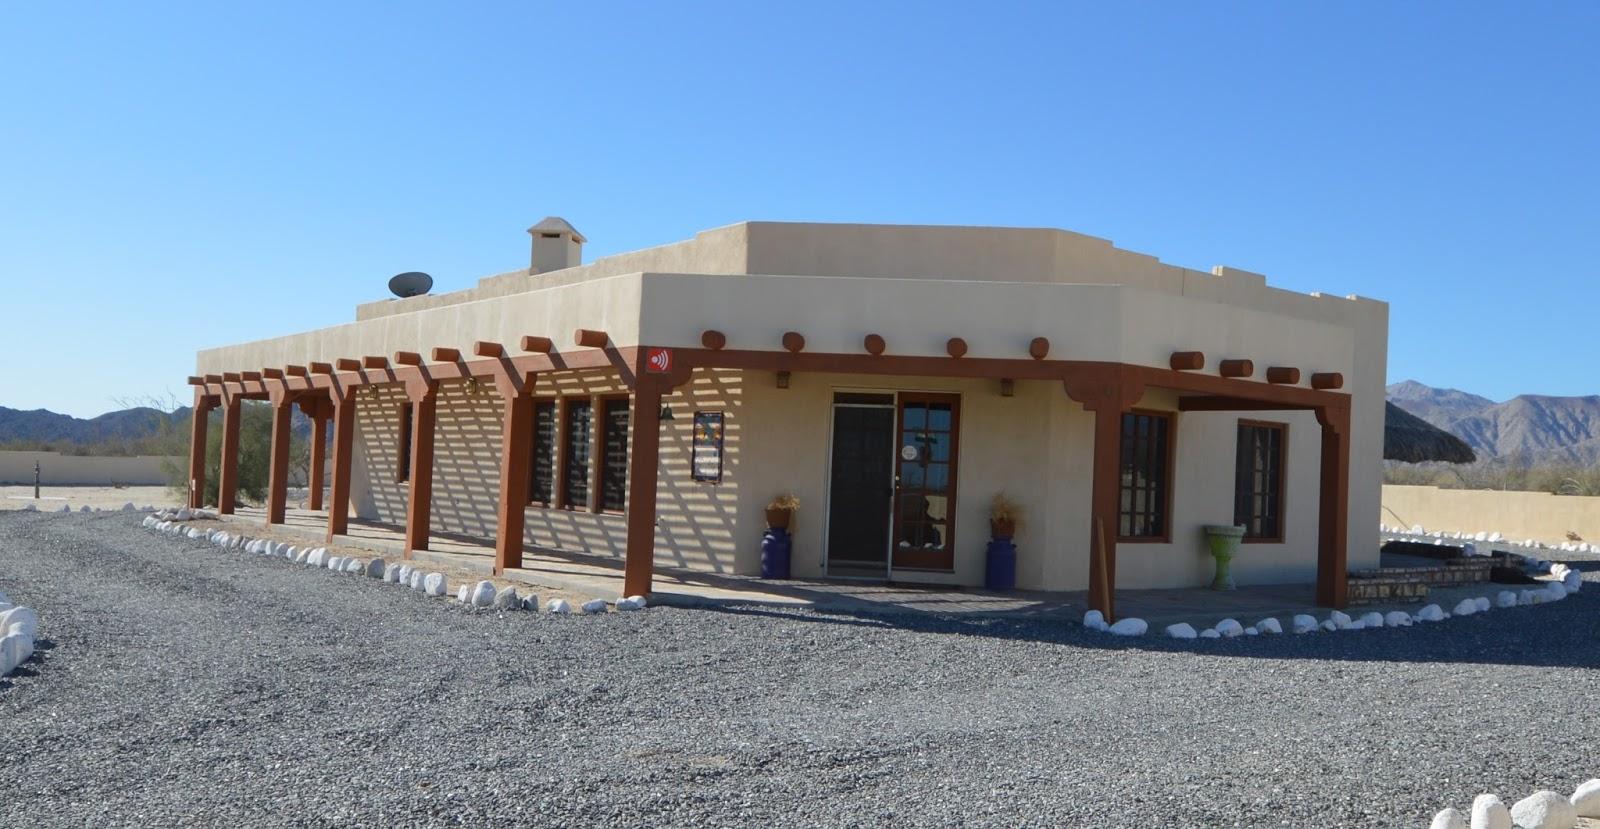 San felipe baja california mexico real estate updates for Solar ranch